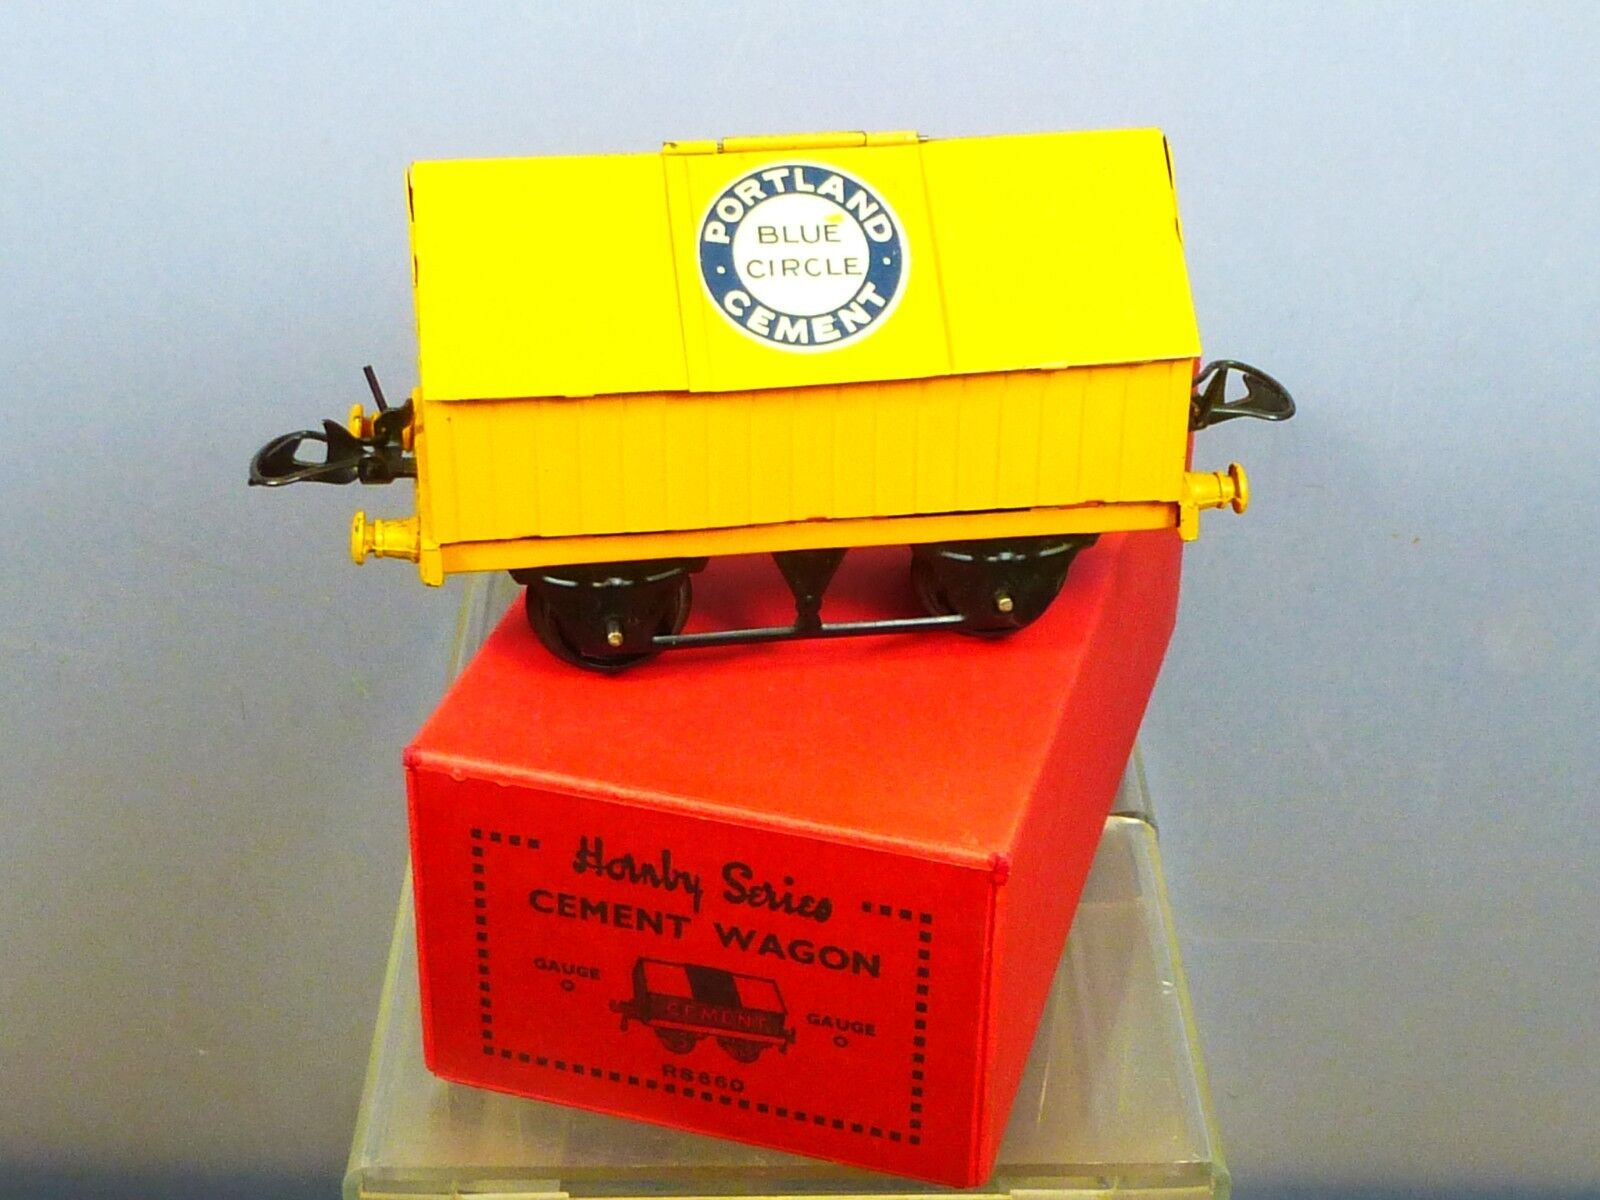 VINTAGE  O  HORNBY MODEL No.1    PORTLAND  blu CIRCLE   CEUomoT WAGON  BOXED